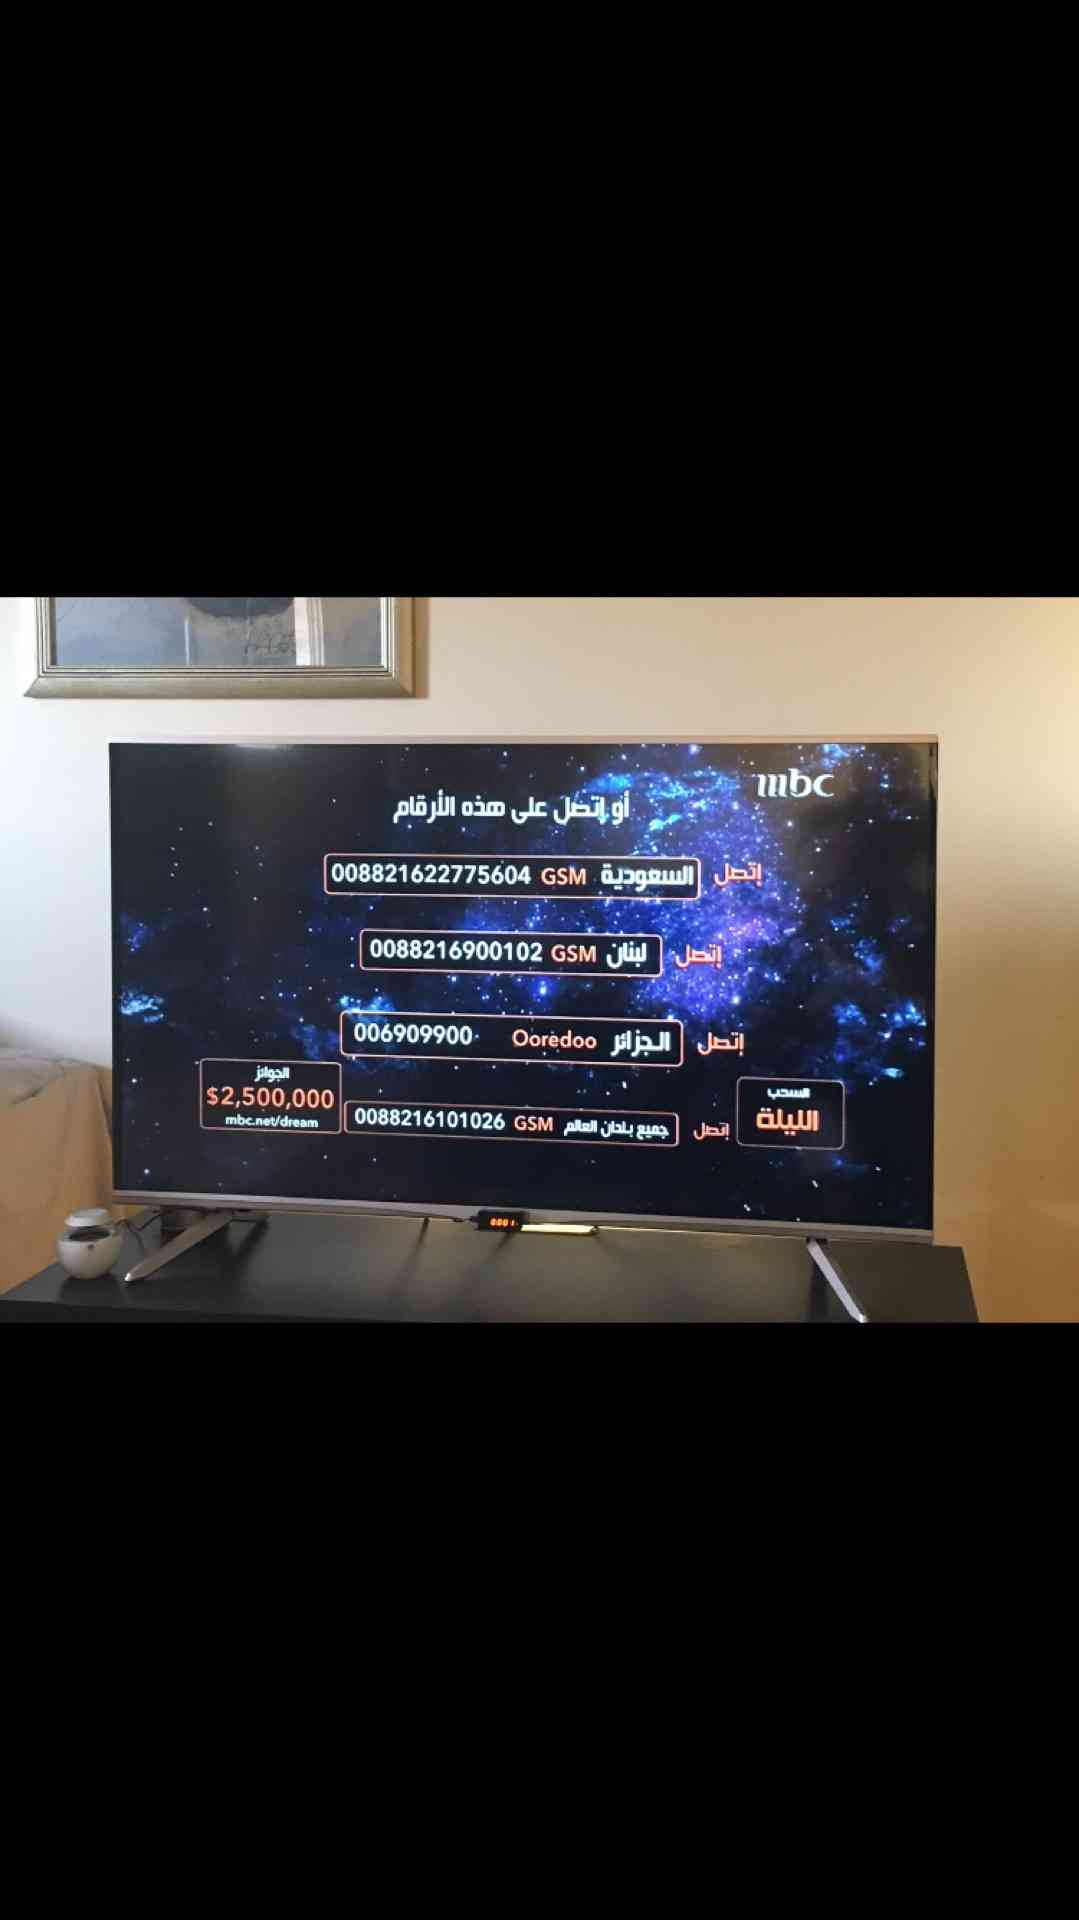 LG OLED 55 Inch 4K Smart Tv-55CX (2020)-  للبيع لاعلى سعر كلاس برو،...